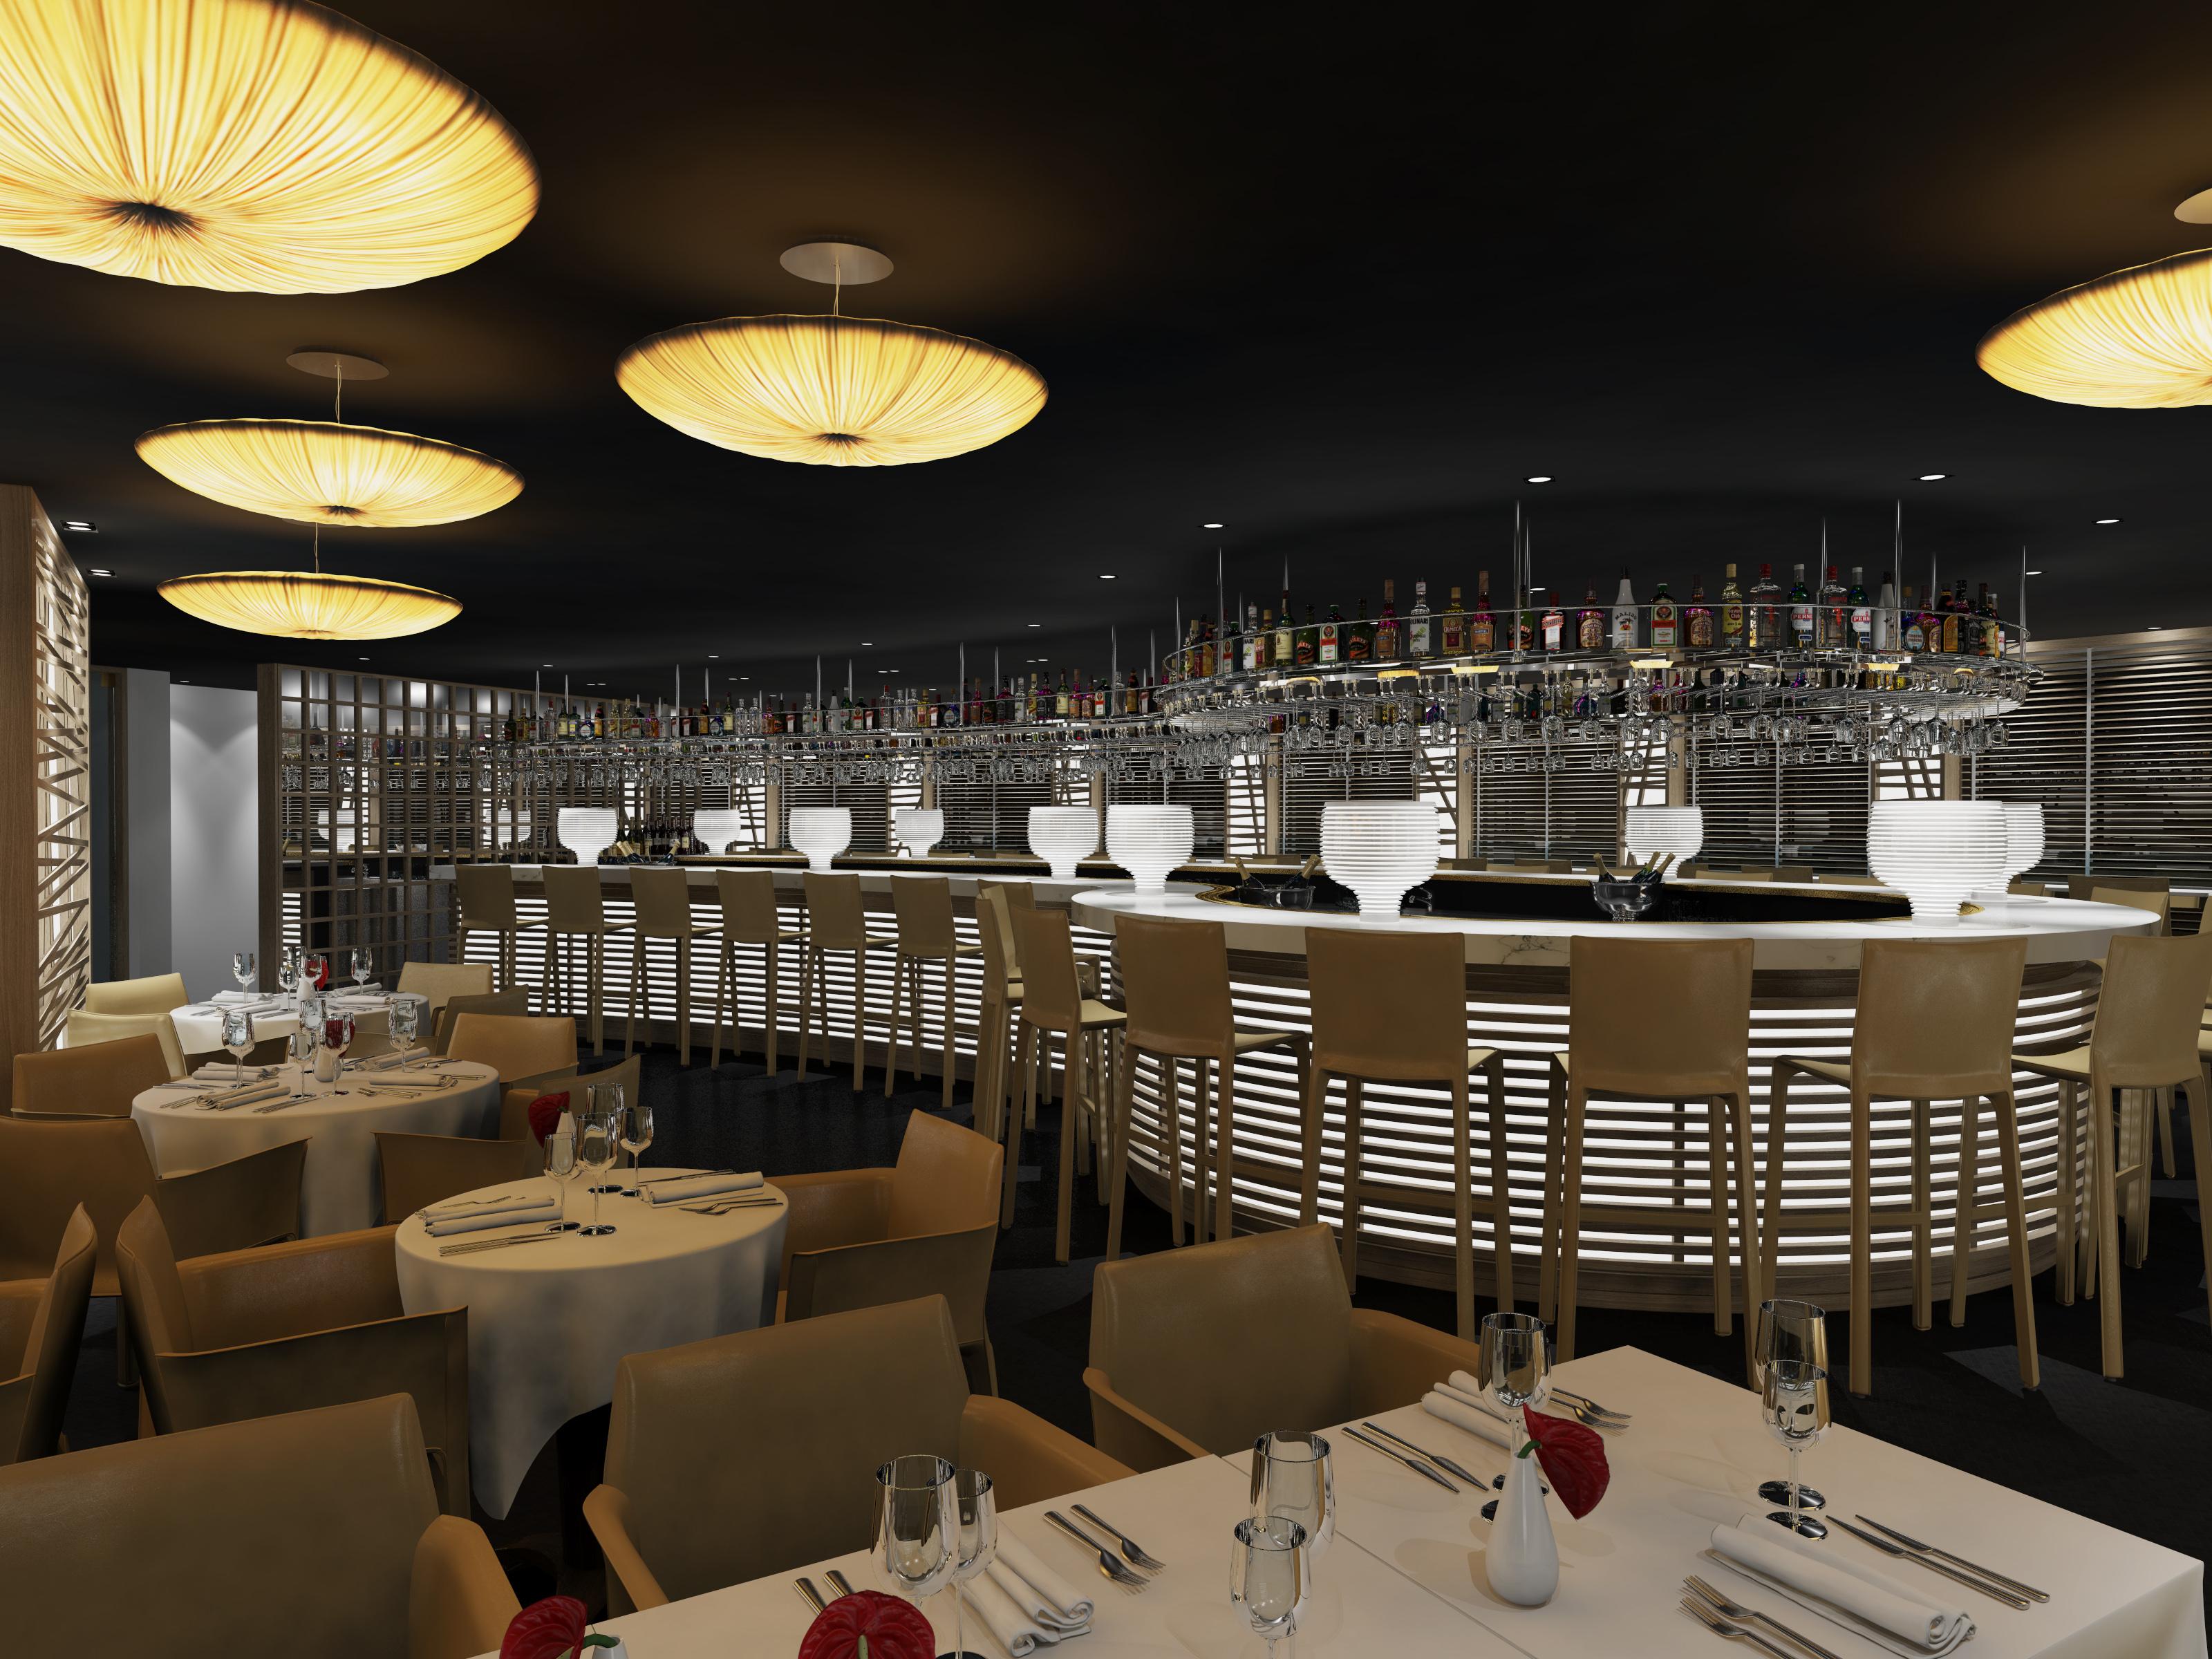 Best Restaurants In Edgbaston